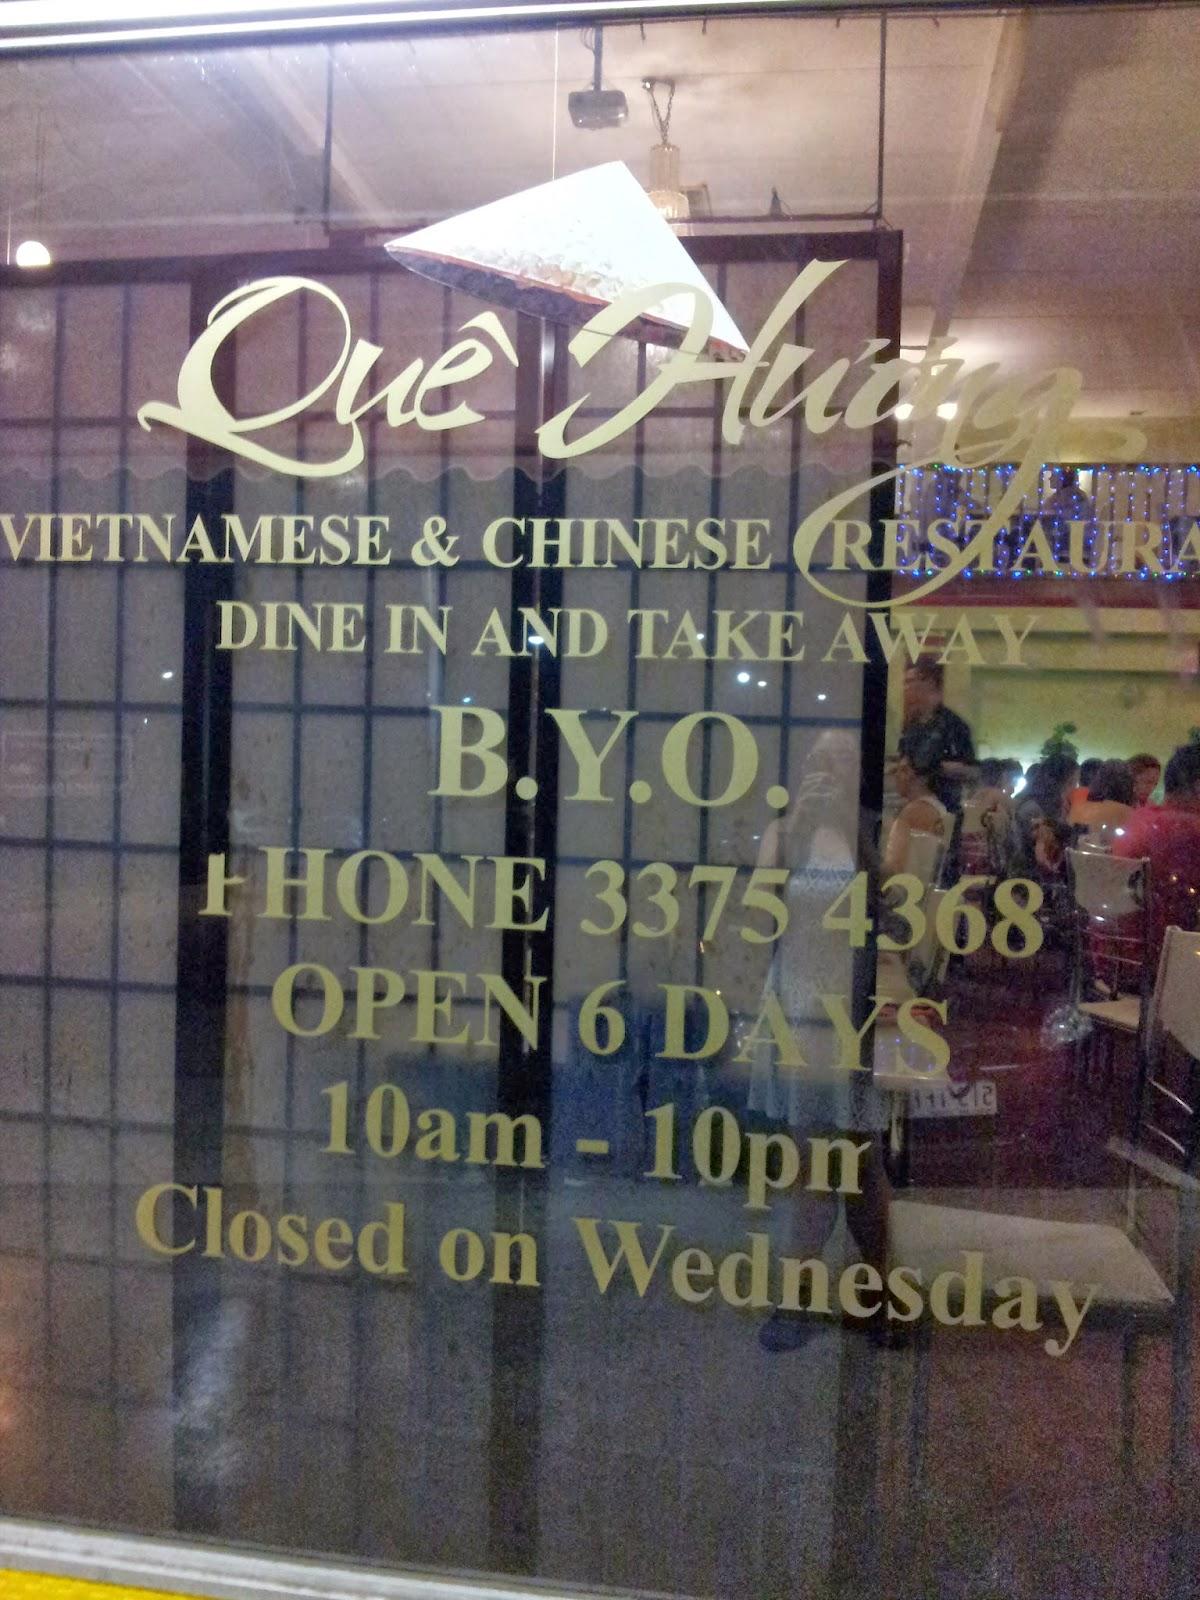 thatseriousgirl: Que Huong Restaurant